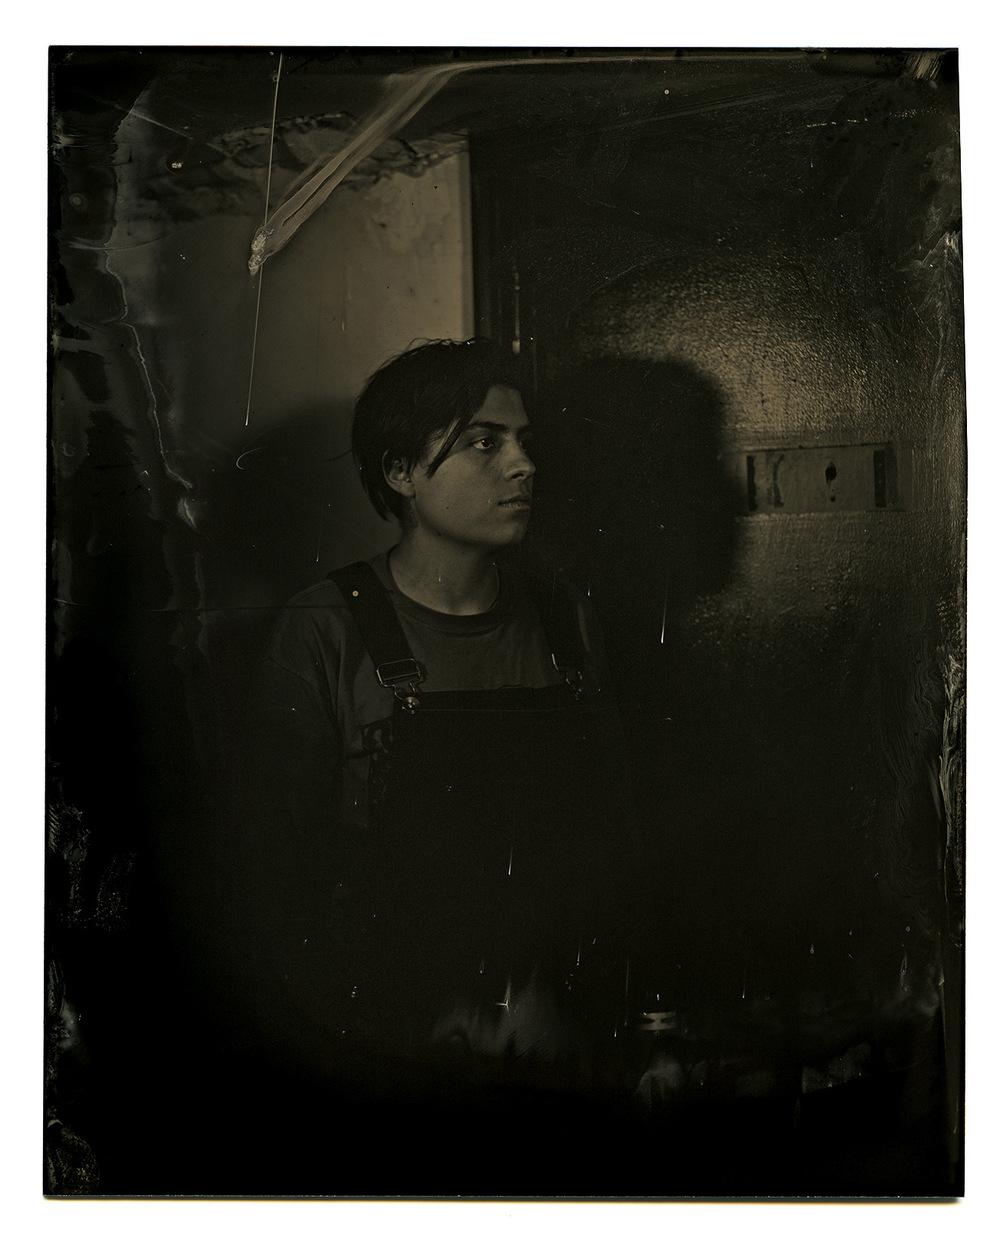 Brian Garbrecht - Rebecca 2017